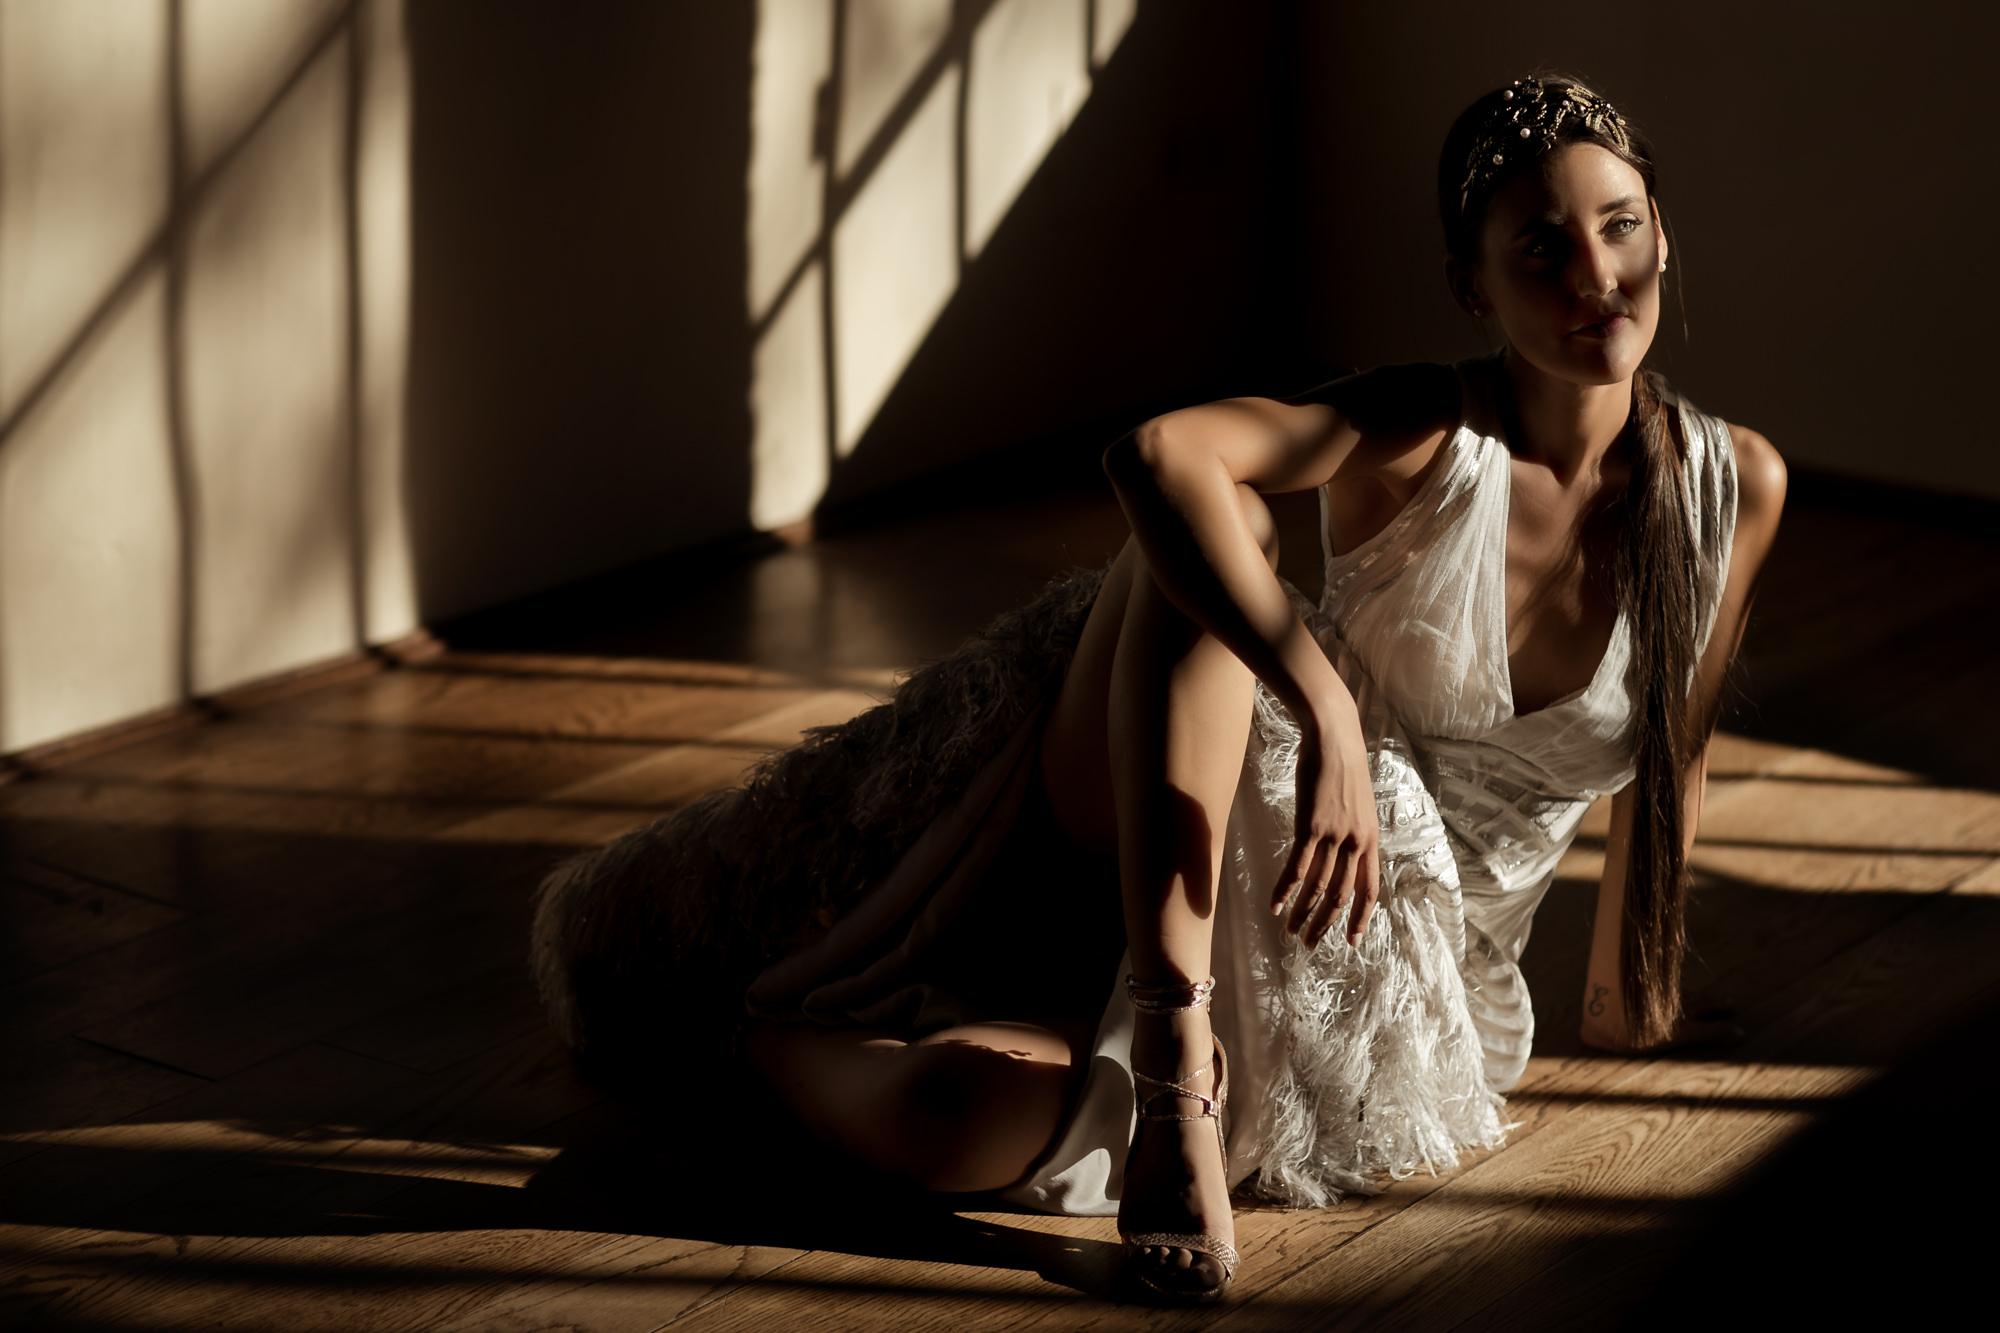 gorgeous-bridal-portrait-guaze-ribbon-dress-with-silk-tassles-bohemian-chic-worlds-best-wedding-photos-david-bastianoni-italy-wedding-photographer